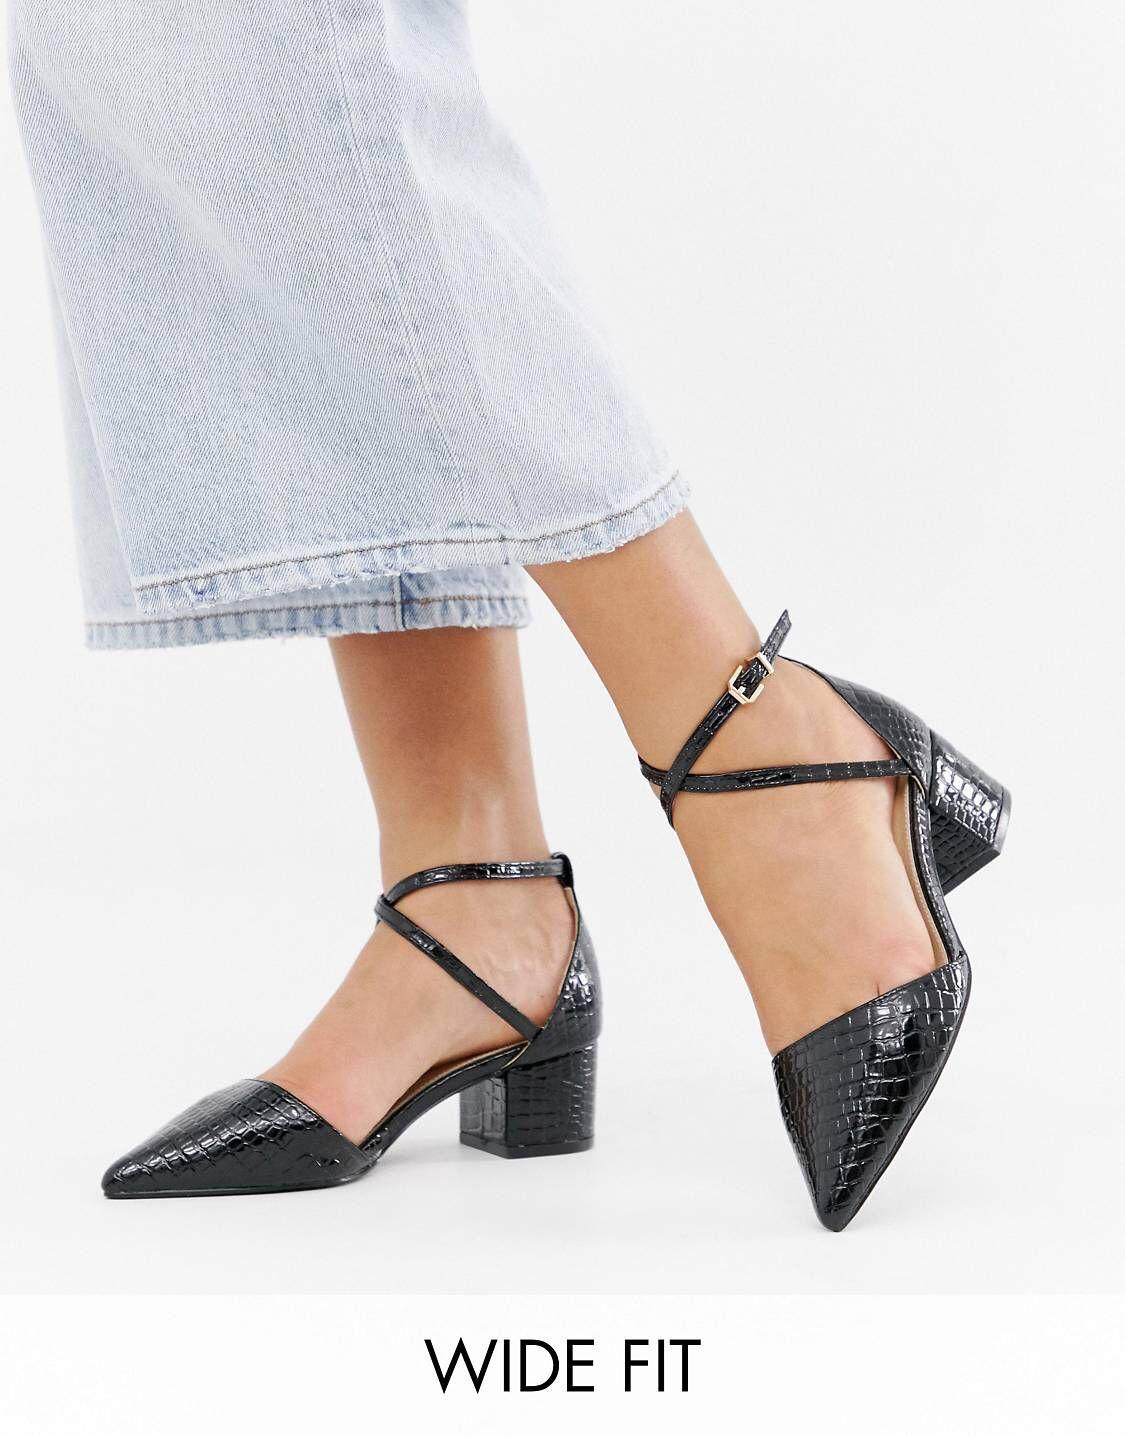 3a4da640006275 RAID Wide Fit Avia black croc mid heeled shoes in 2019